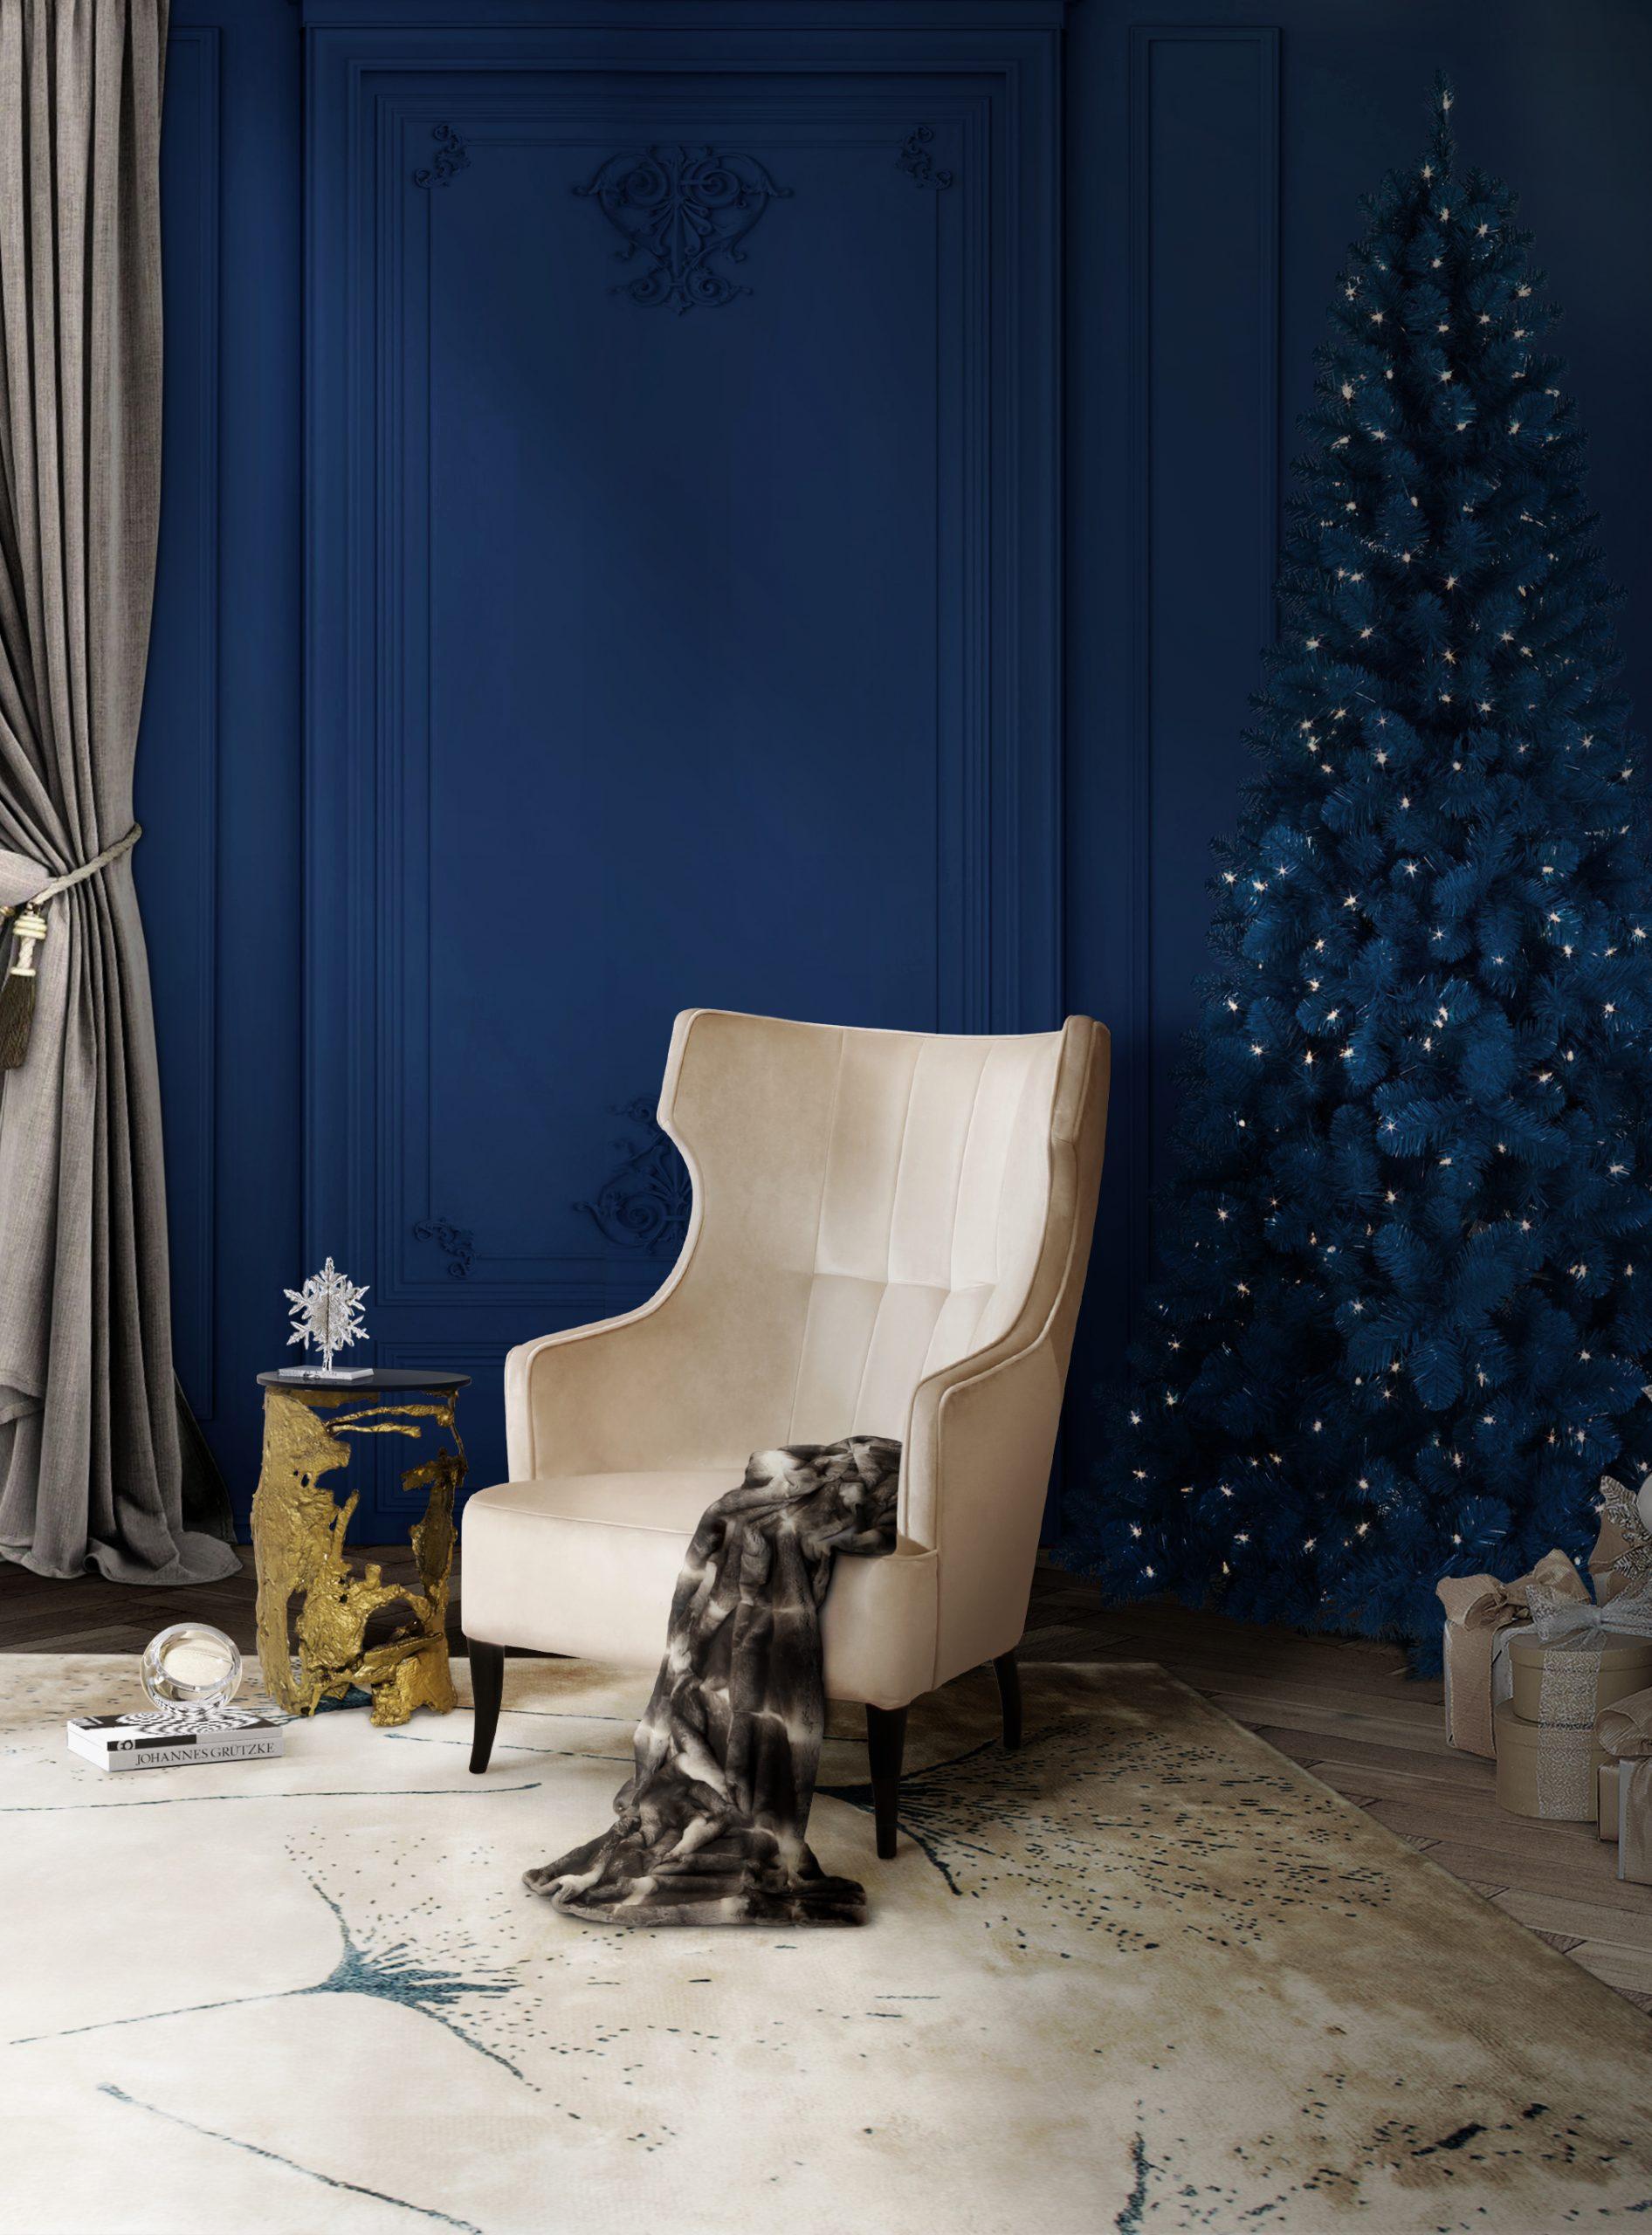 Holiday Season: BRABBU Will Add a Holiday Feeling to Your House holiday seasonHoliday Season: BRABBU Will Add a Holiday Feeling to Your Houseiguazo natal scaled